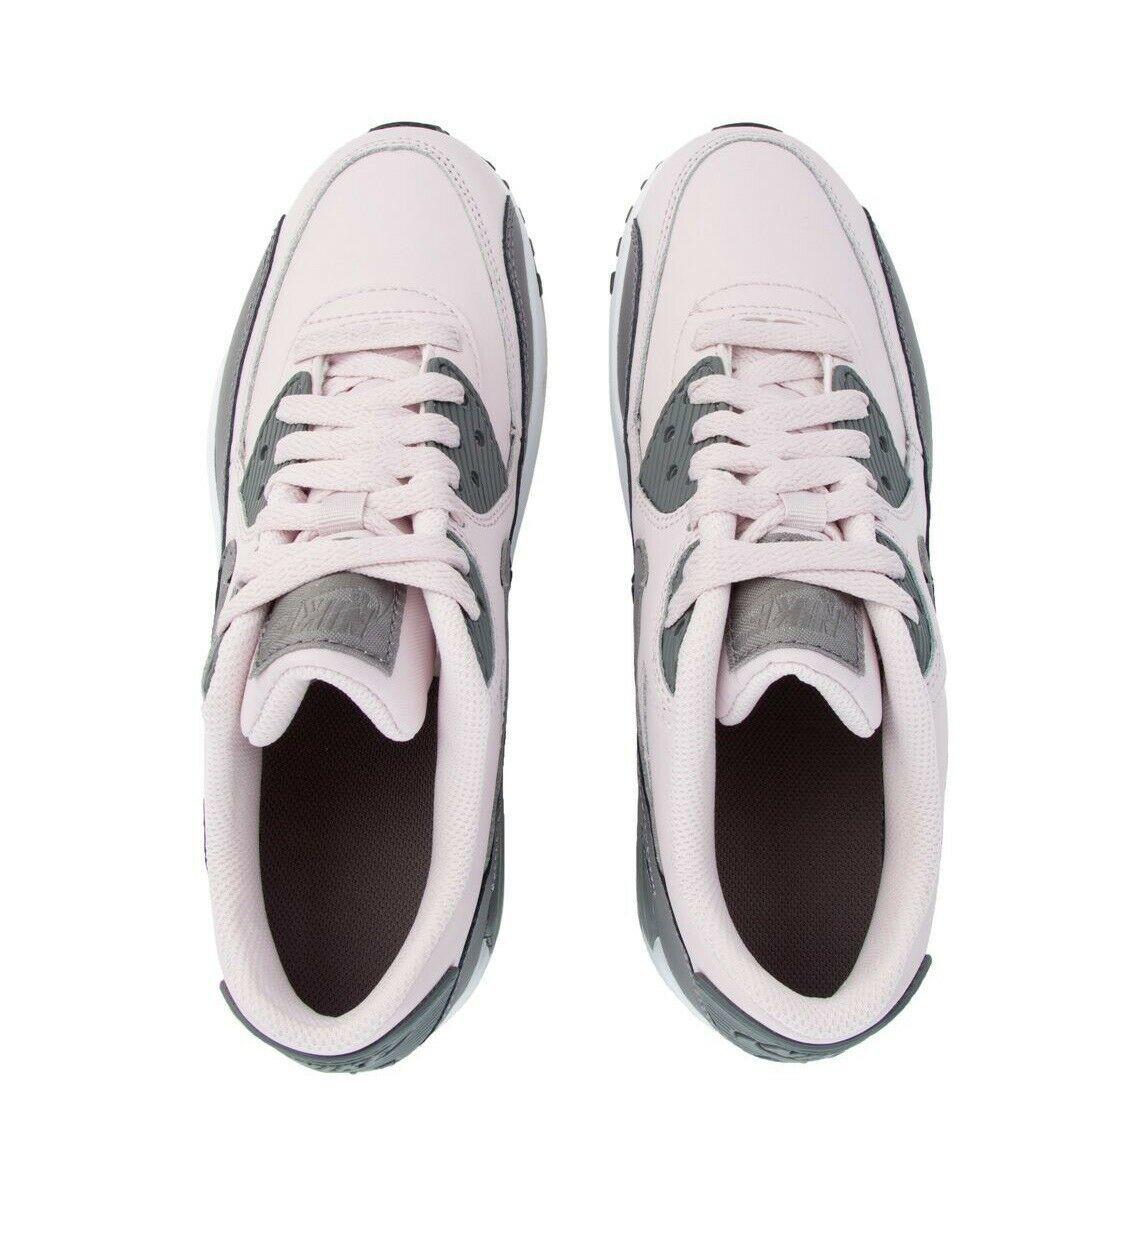 Nike Air Max 90 LTR (GS) Barely Rose Gunsmoke White Grade School 833376 601 image 4